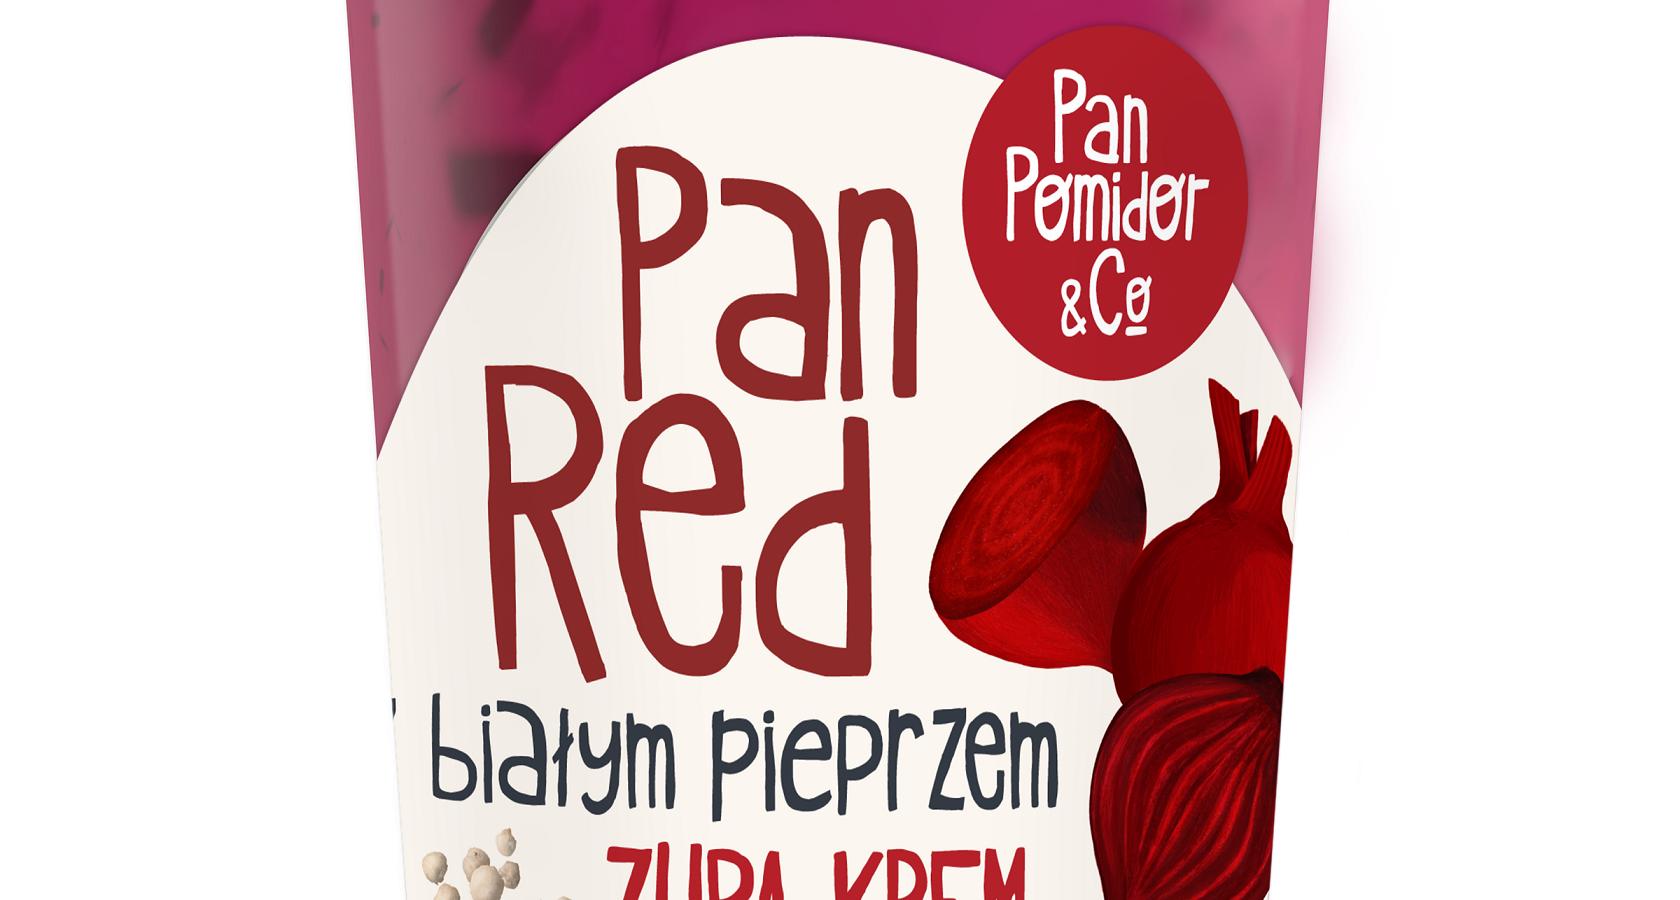 Pan Red – nowa wiosenna zupa krem marki Pan Pomidor&Co.